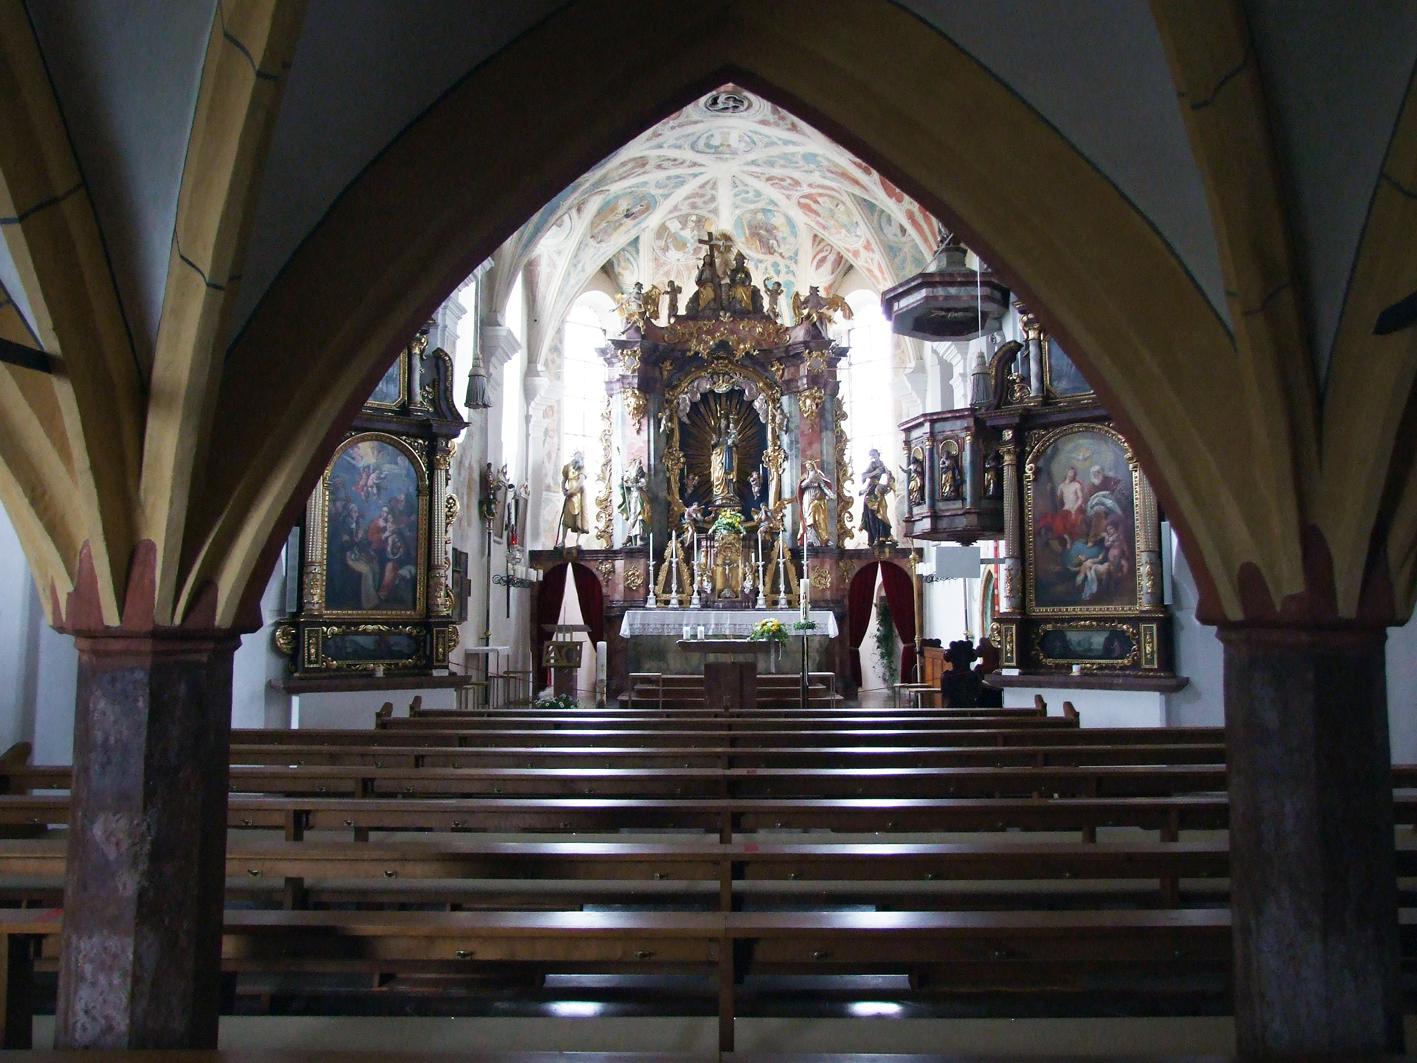 2021 05 17 aoelfb niedergottsau kirche mariae himmelfahrt blick in kirche